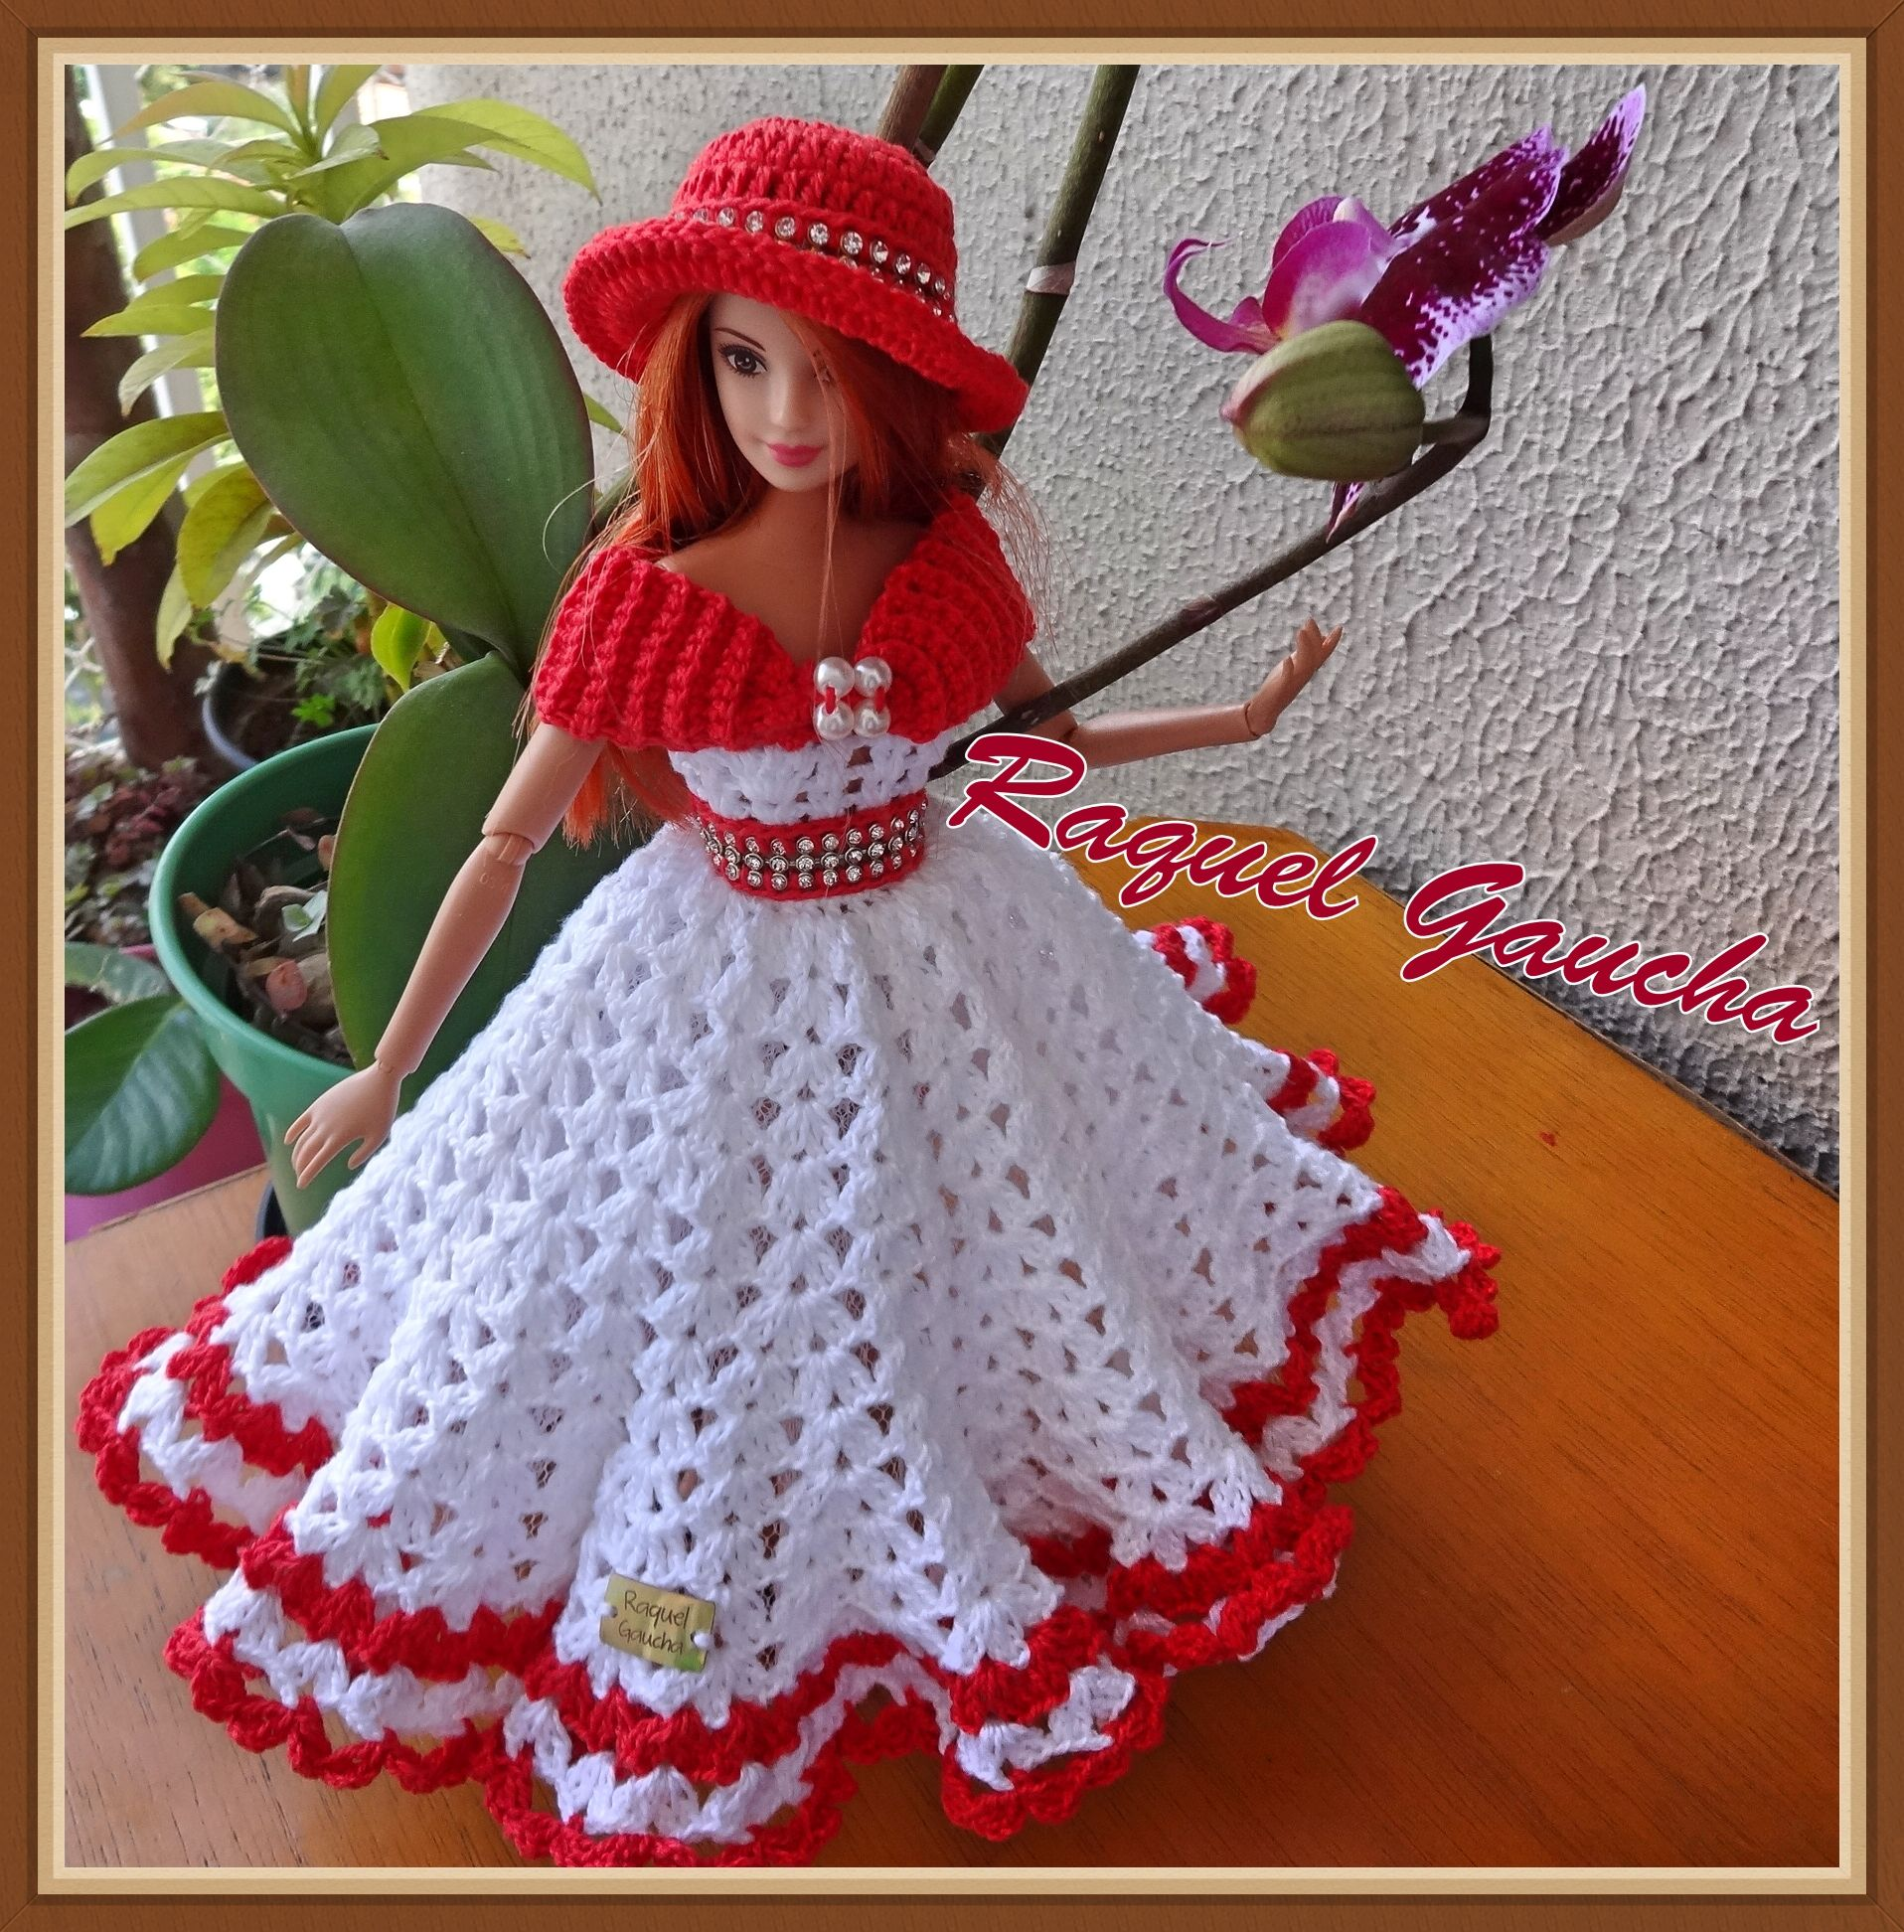 3f7dc6c3d17d #RaquelGaucha #Barbie #Crochet #Doll #Dress #Vestido #Crochê #Chapéu  #Sombrero #Muñeca #Boneca